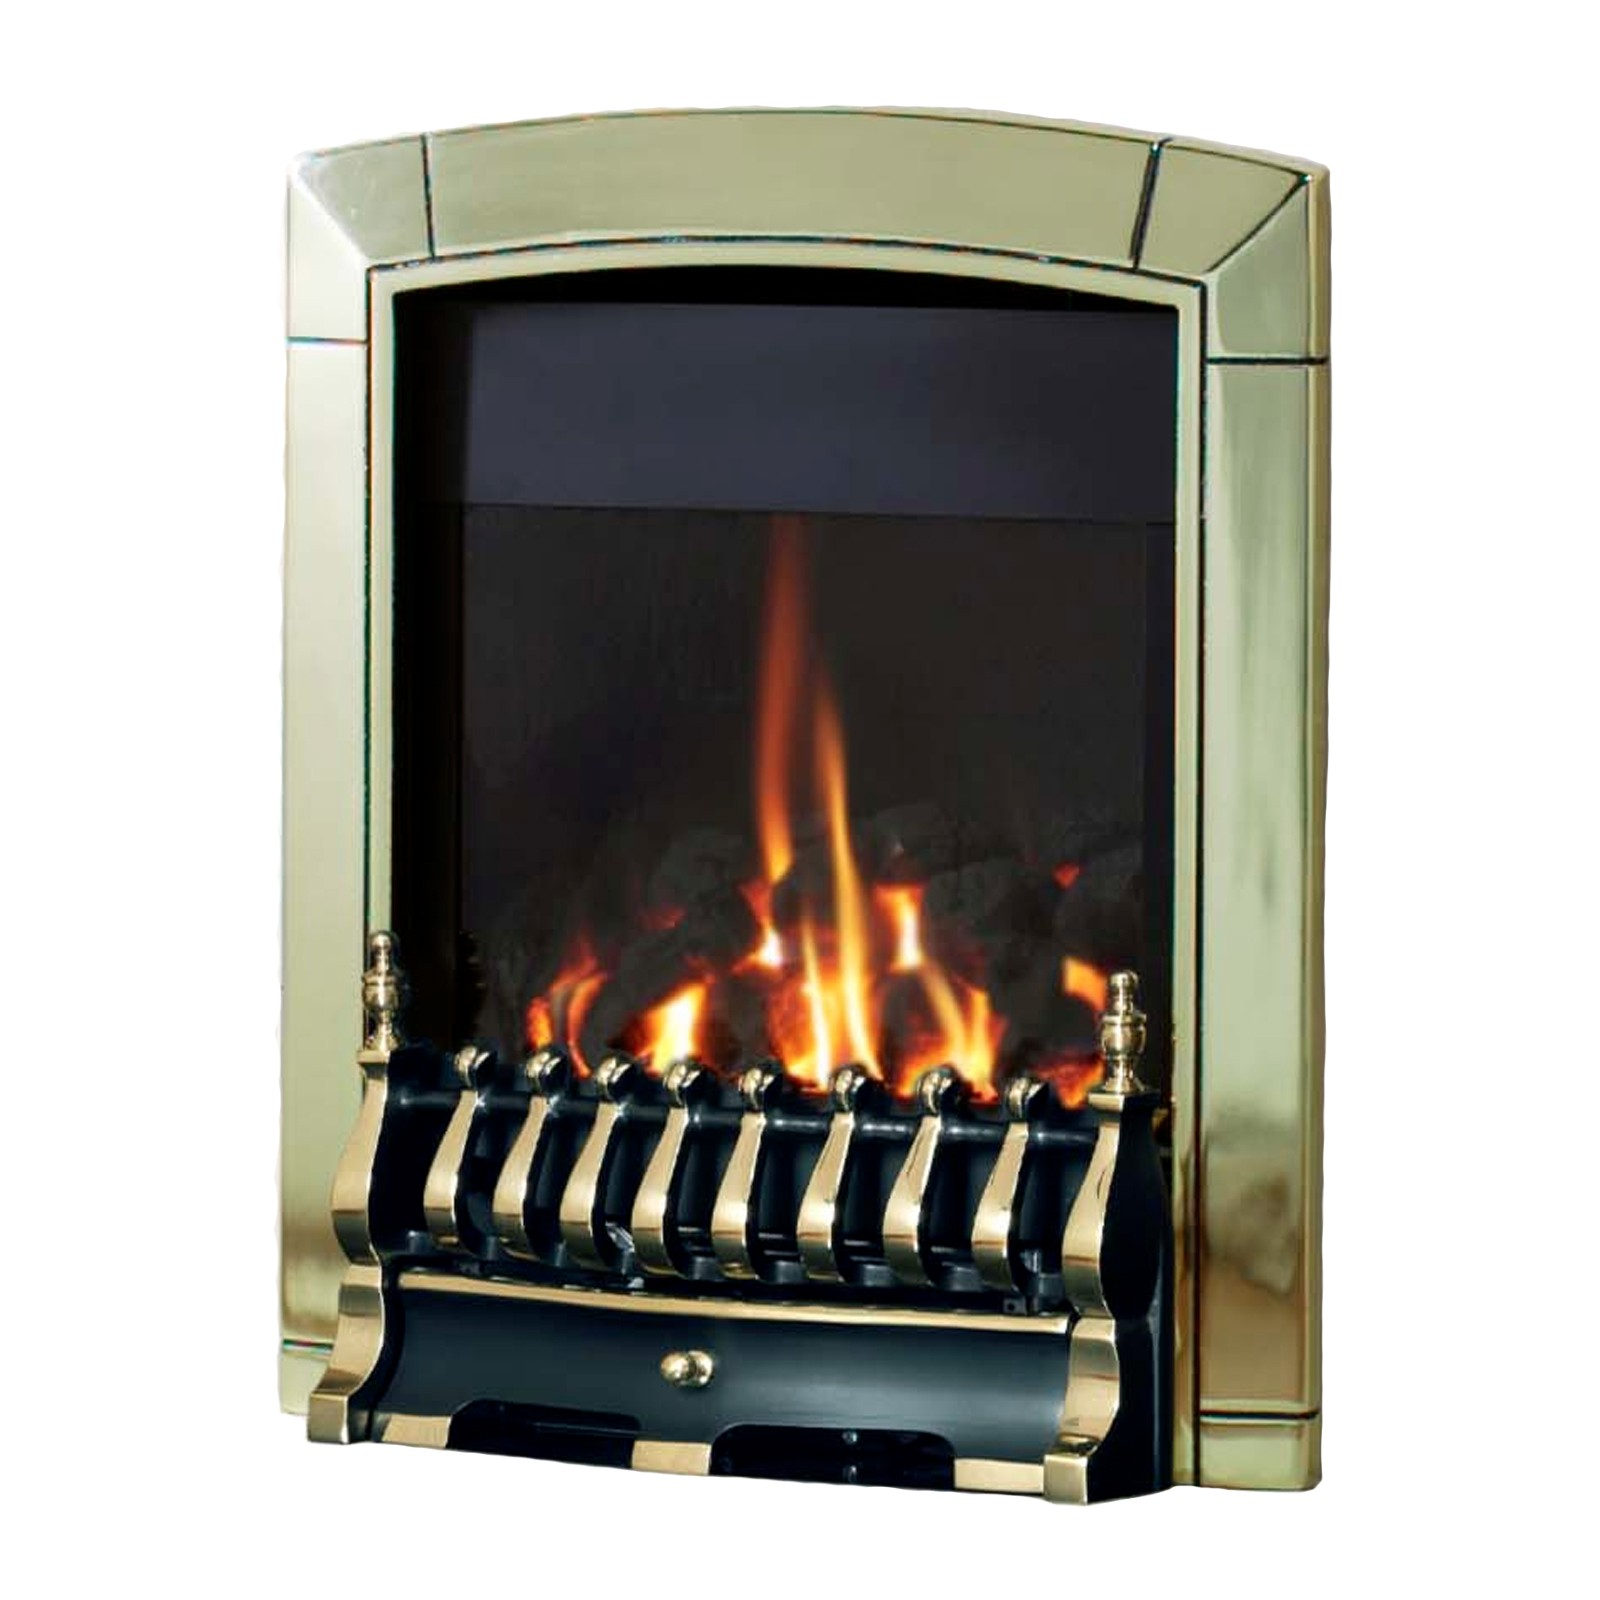 Striking Fire Flavel Caress Plus Traditional Brass Gas